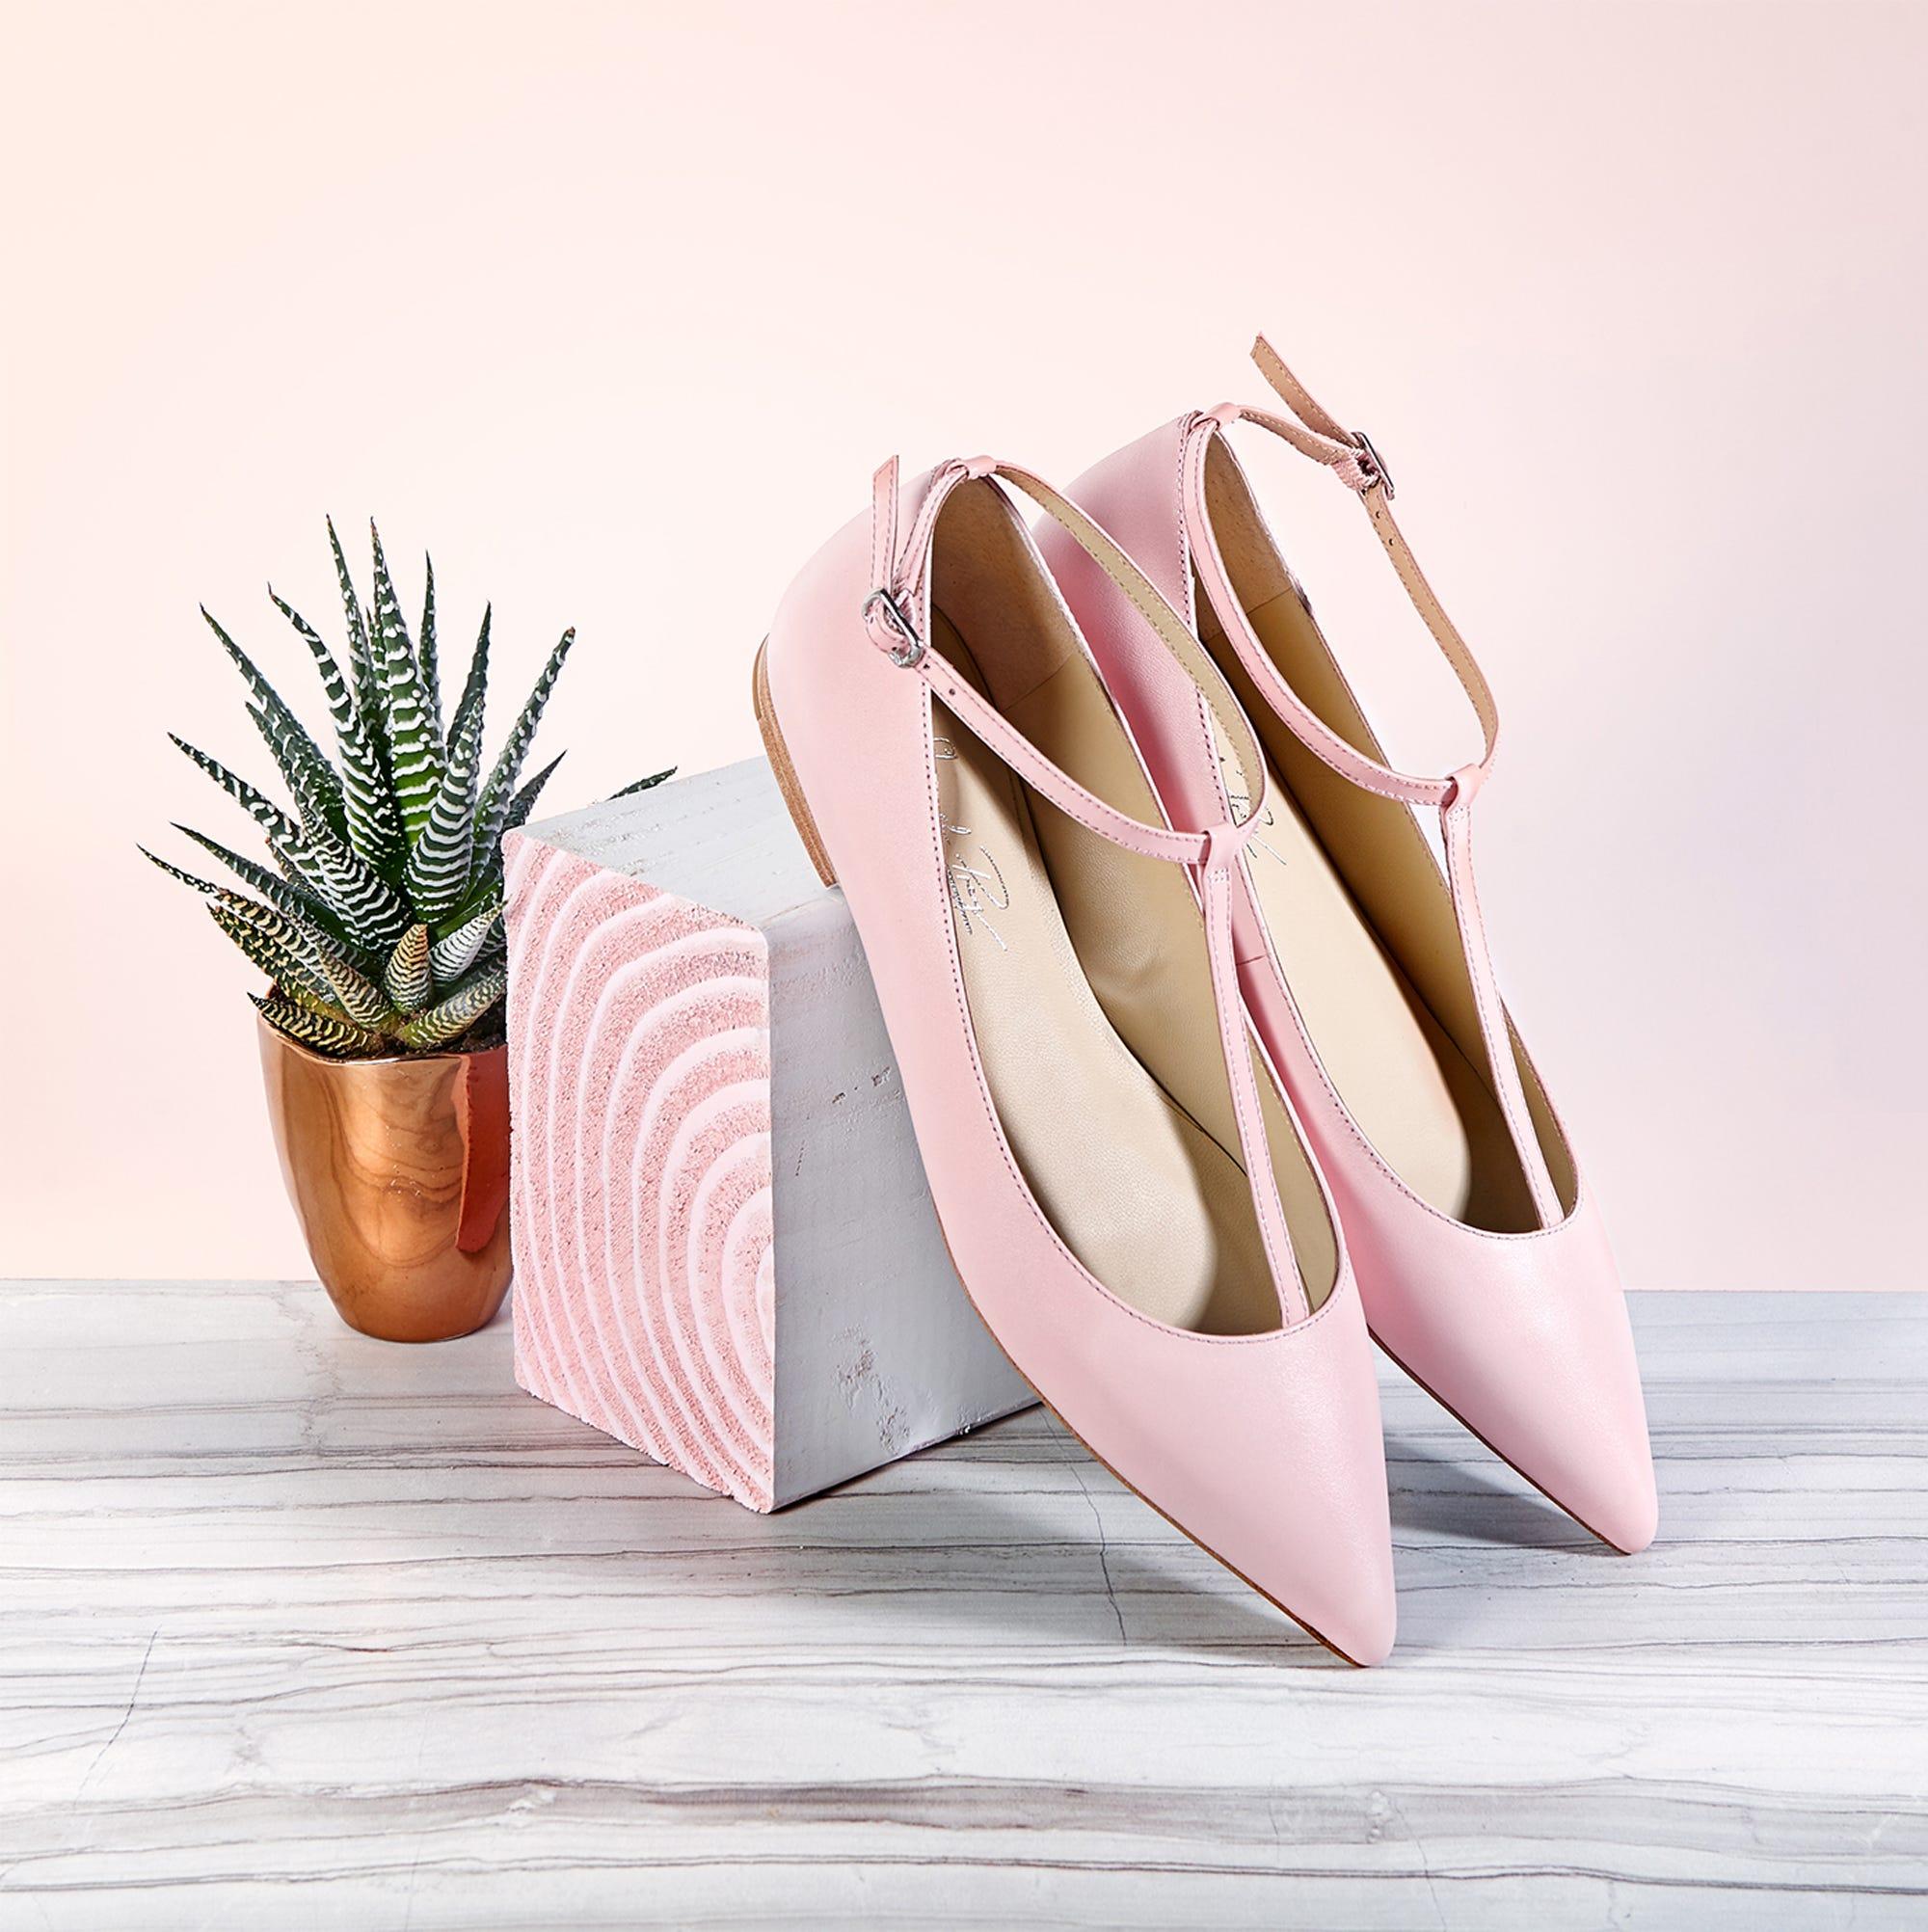 367689c5da1 Affordable Customized Shoes - Margaux